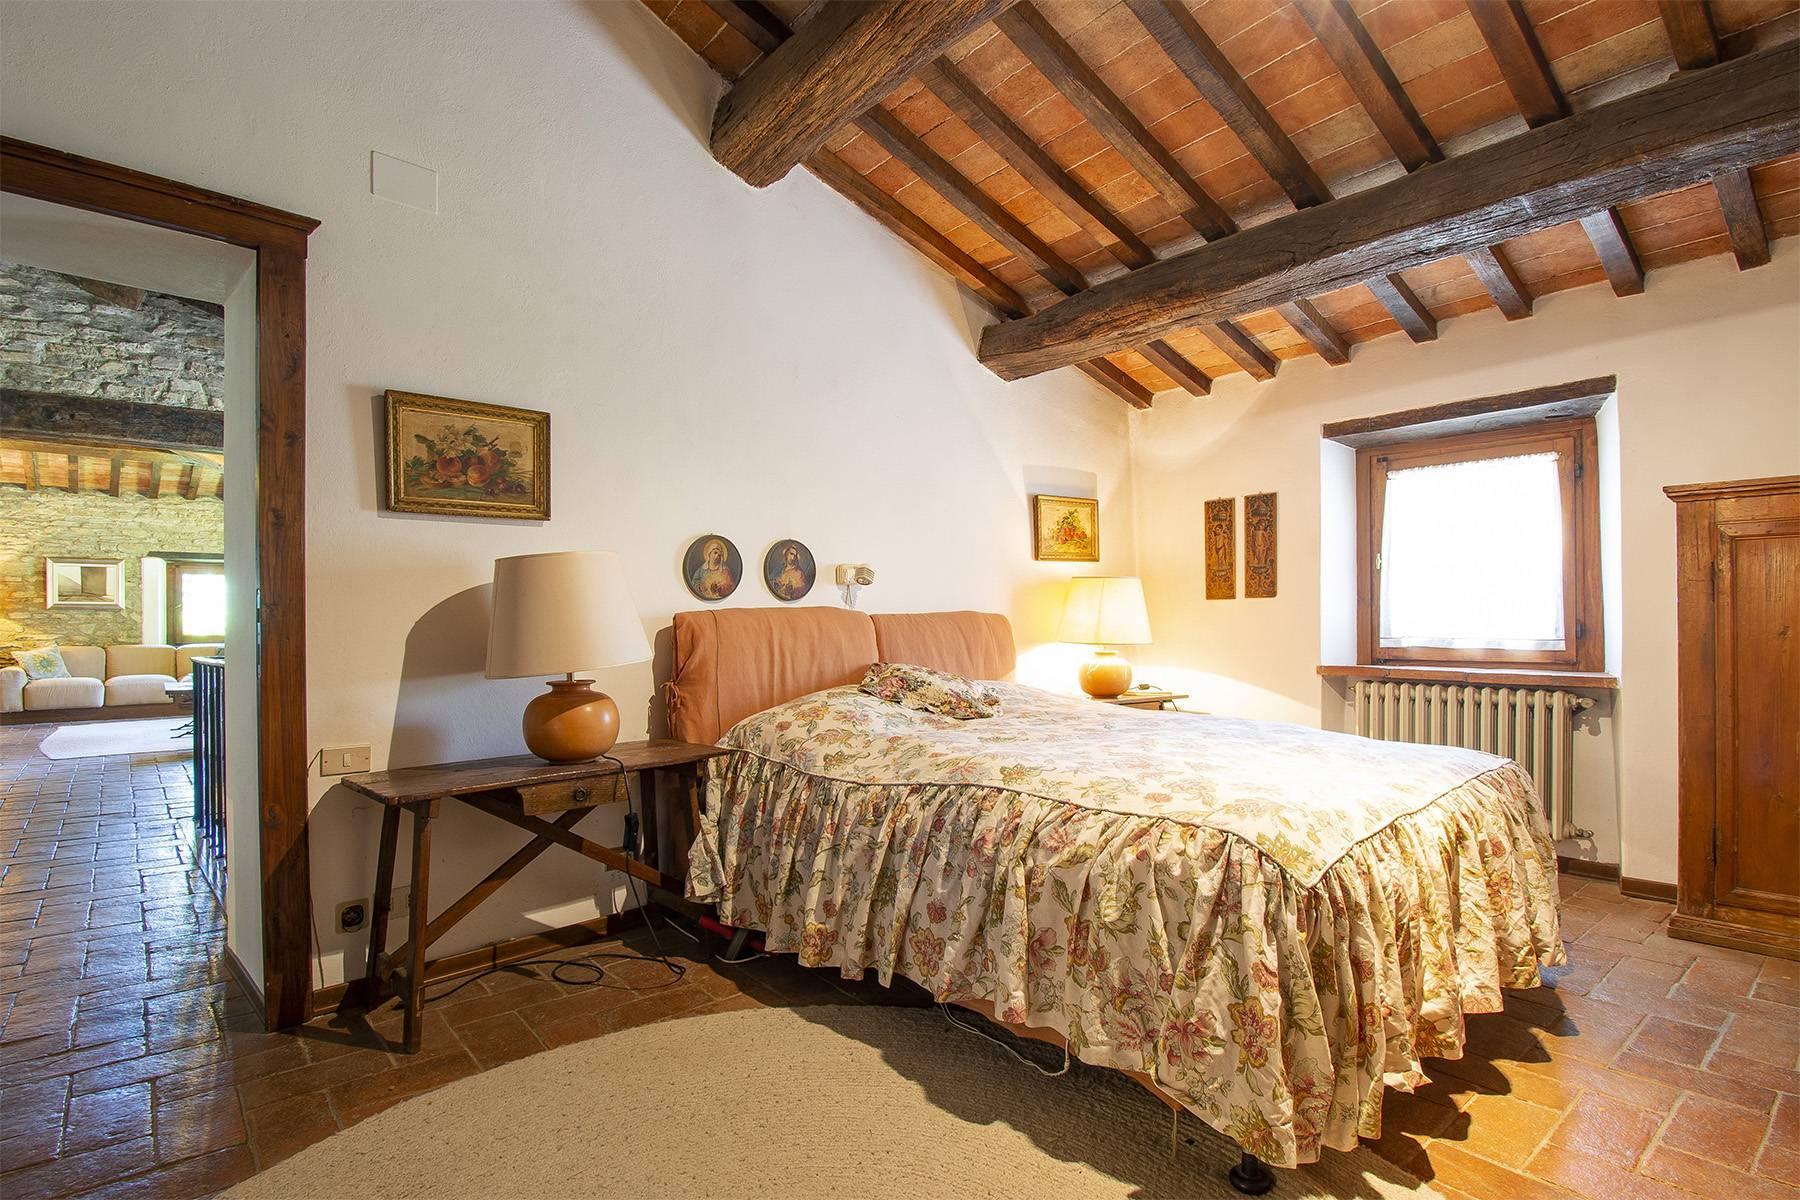 Tipico casale Toscano con vista incantevole su Arezzo - 17